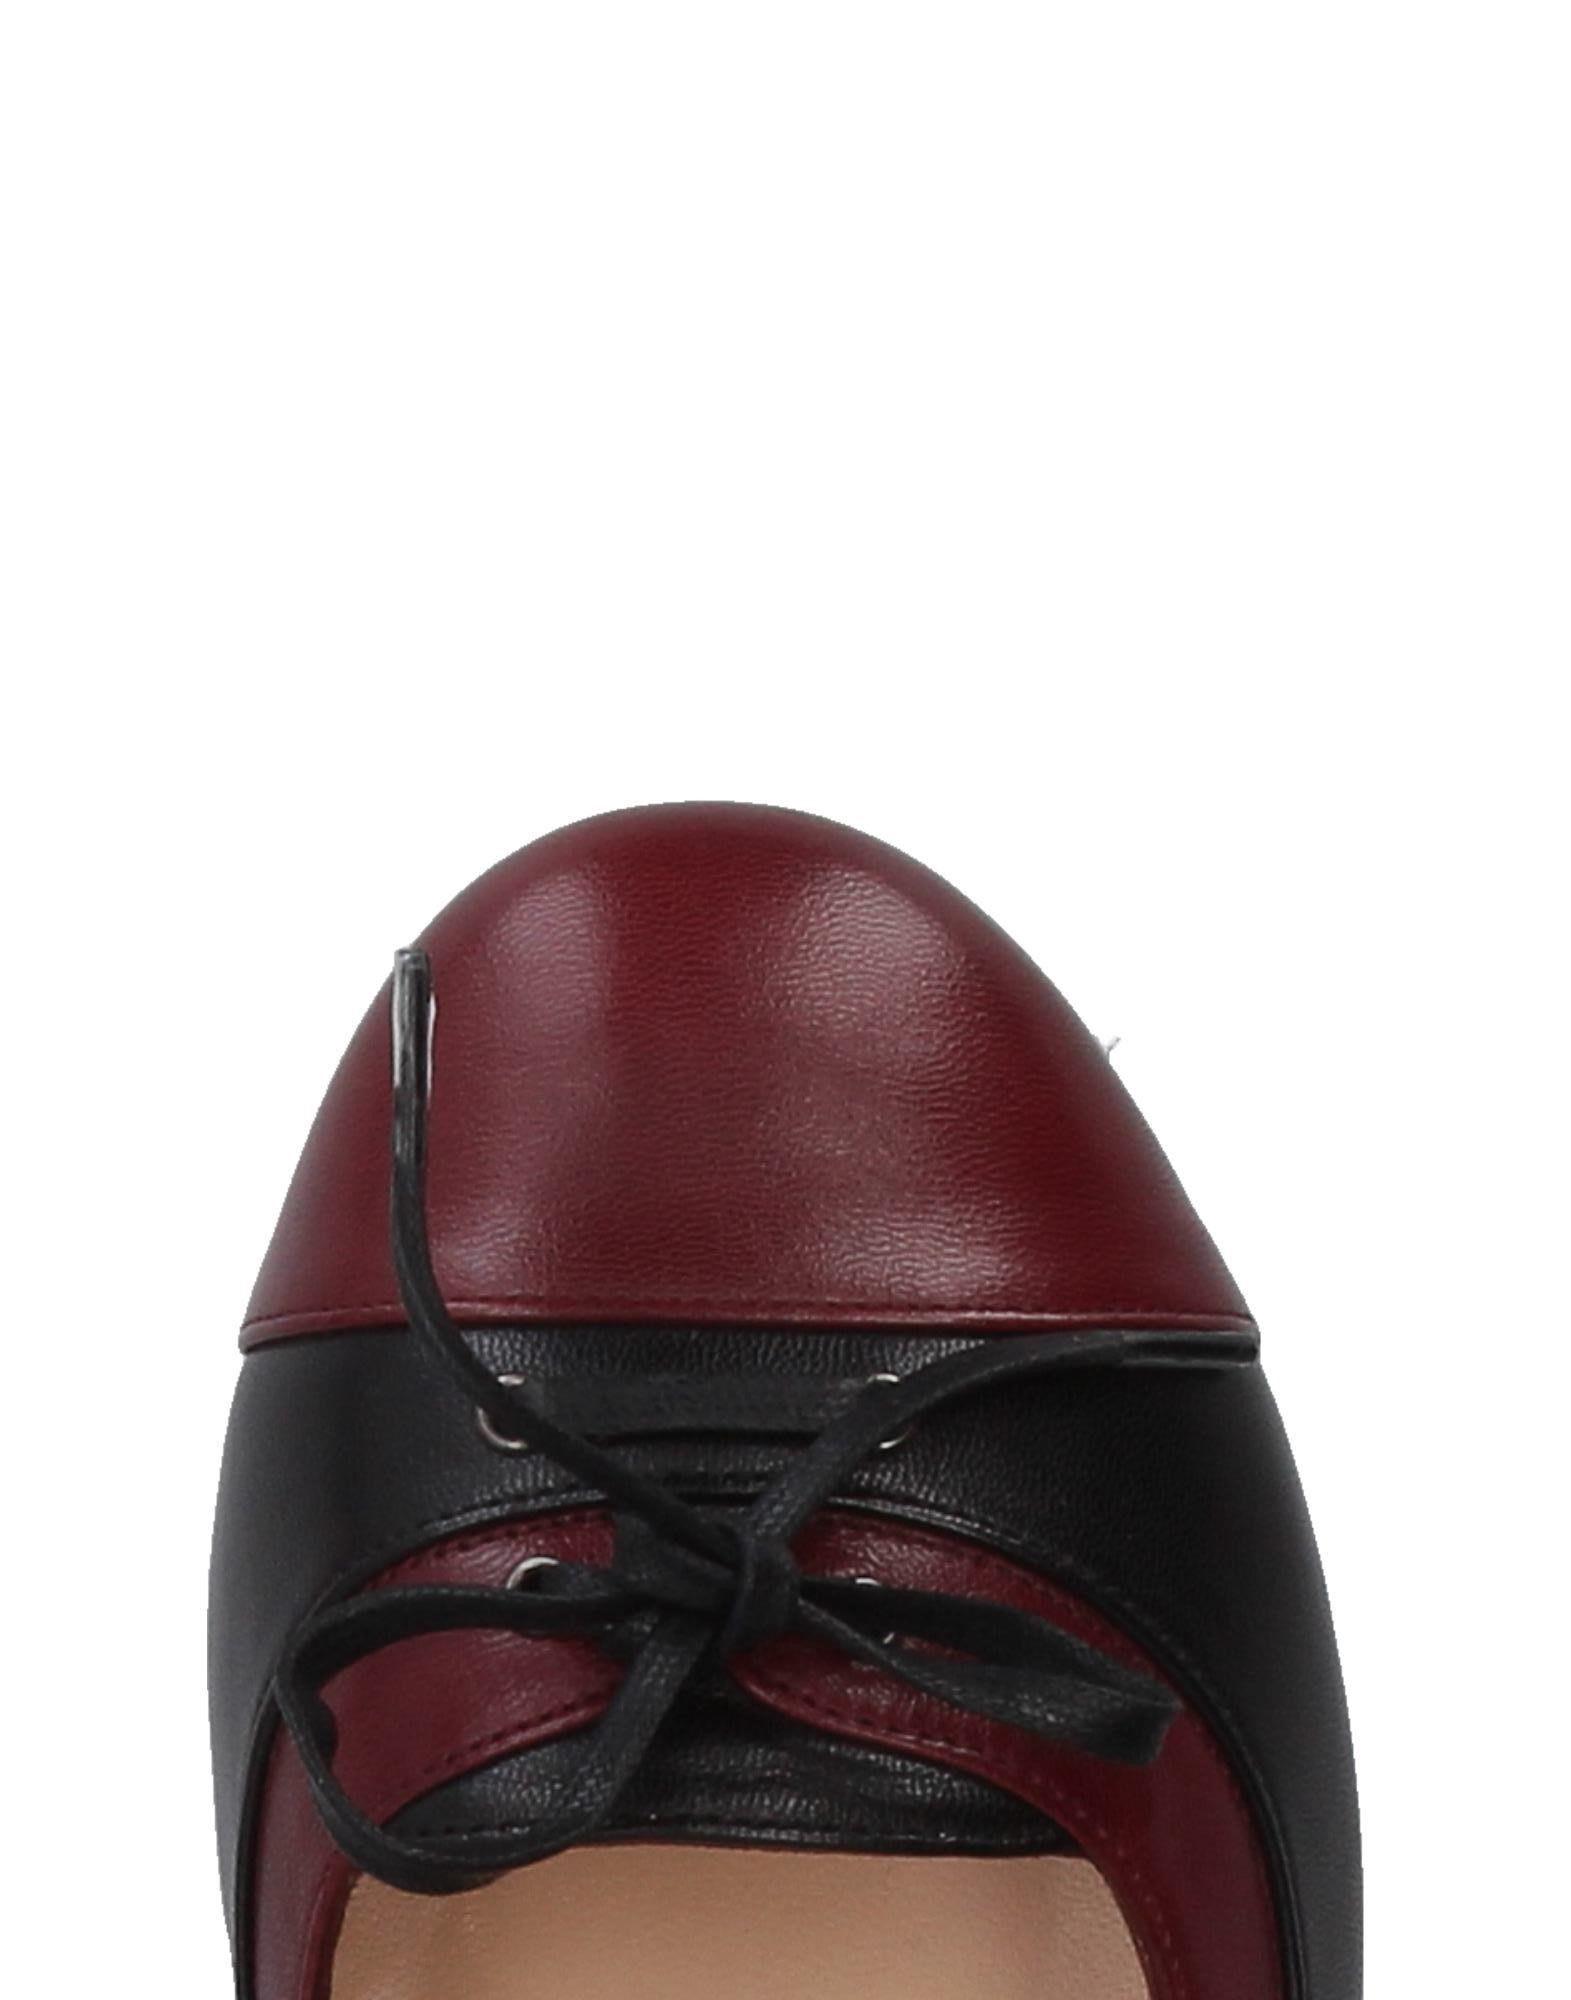 Stilvolle Stilvolle Stilvolle billige Schuhe A.Testoni Ballerinas Damen  11408417RC 0daa6d